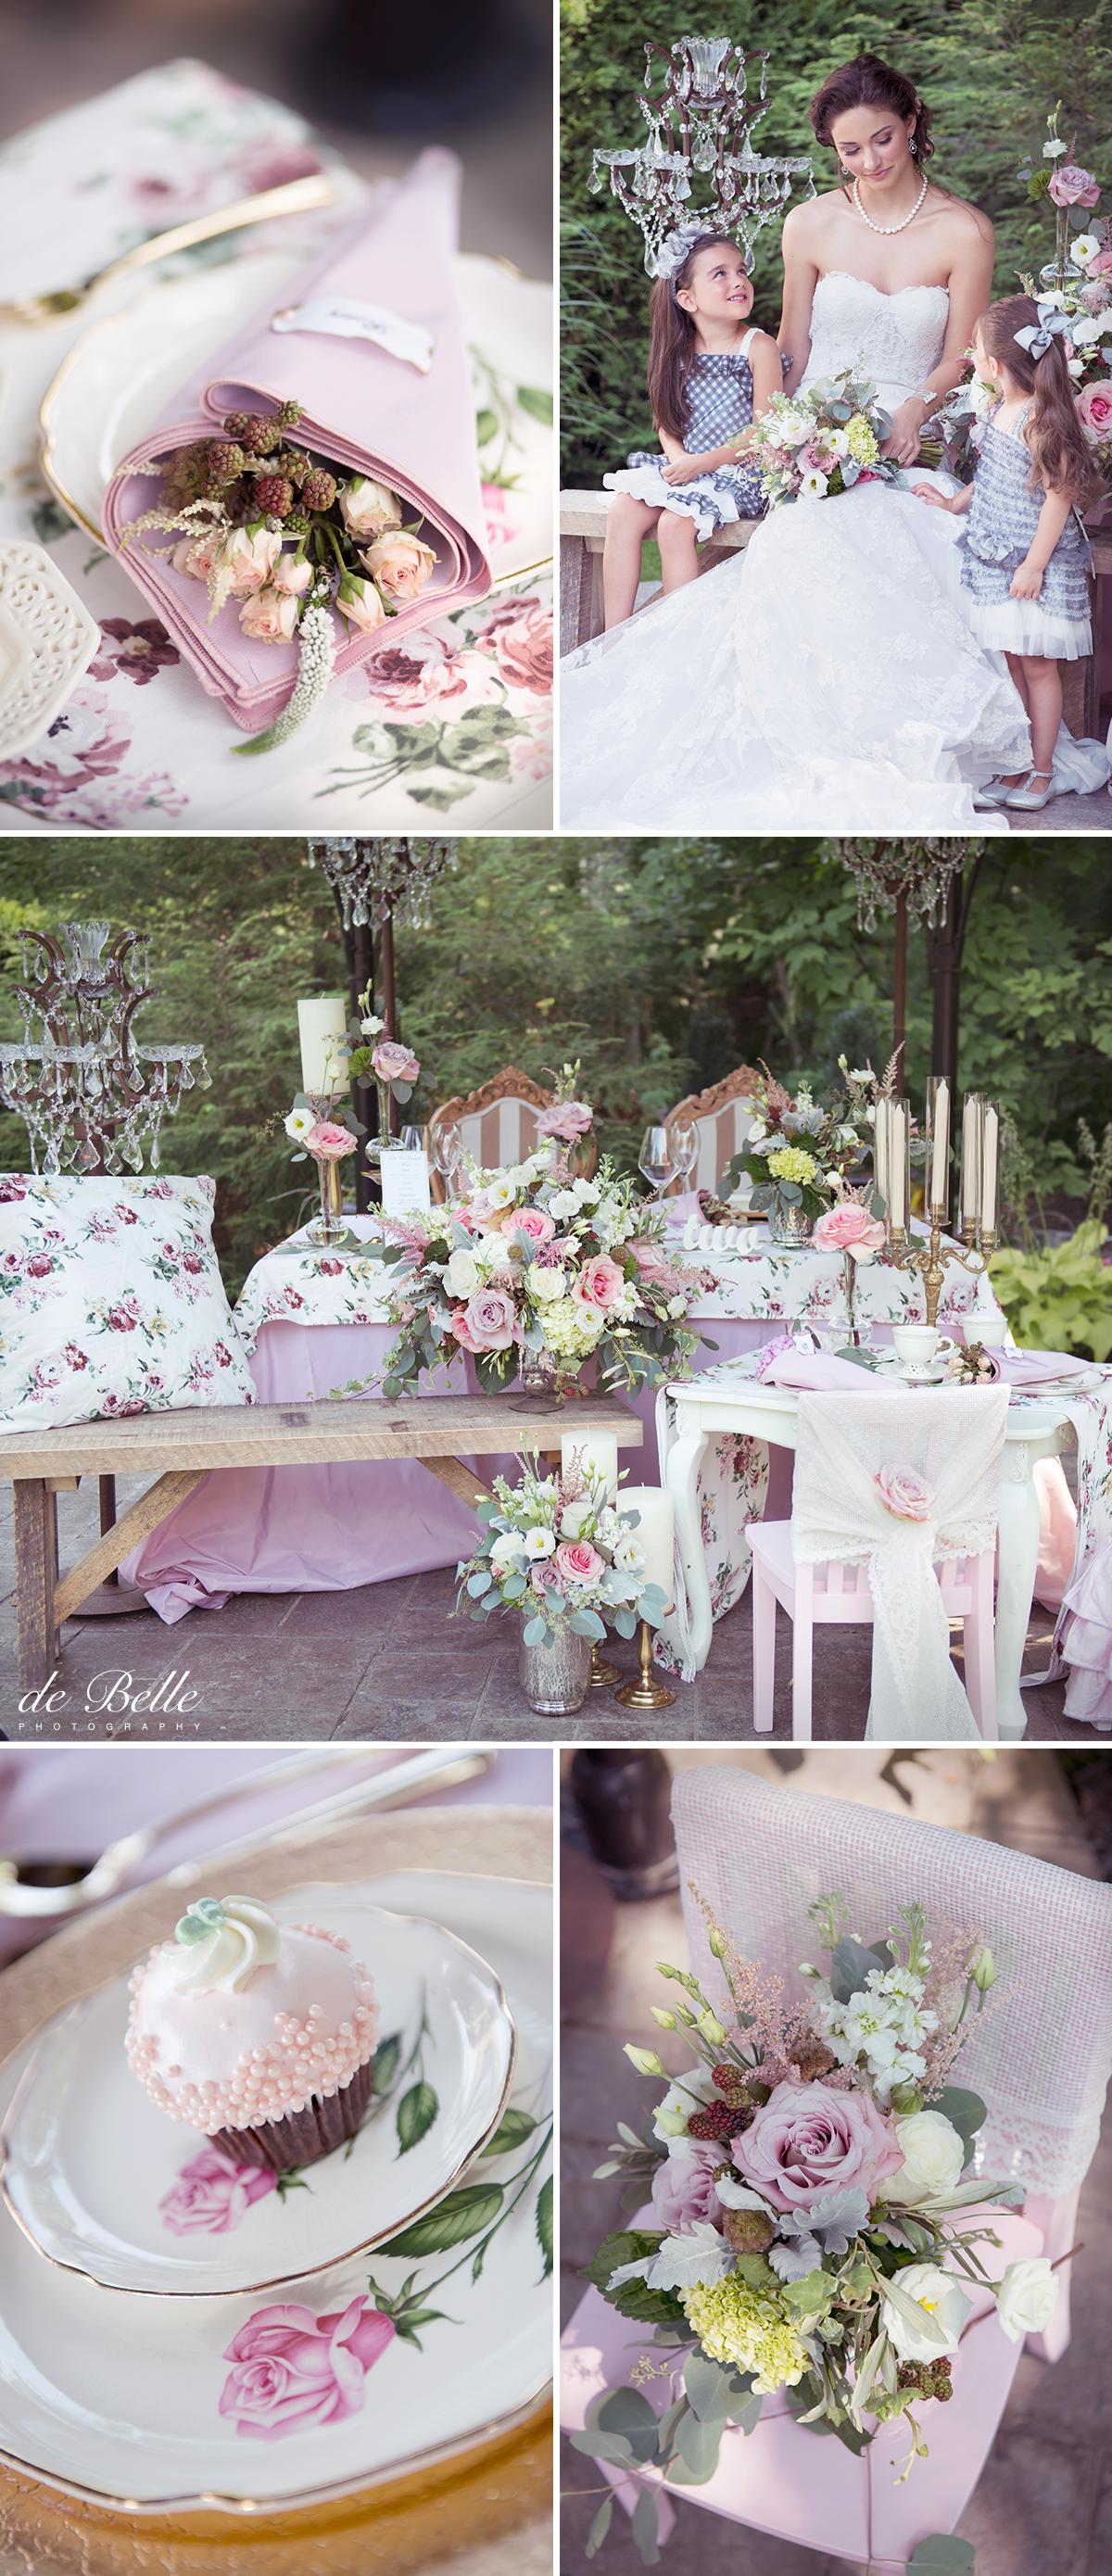 Montreal-Wedding-Photographer-Debelle-EW2